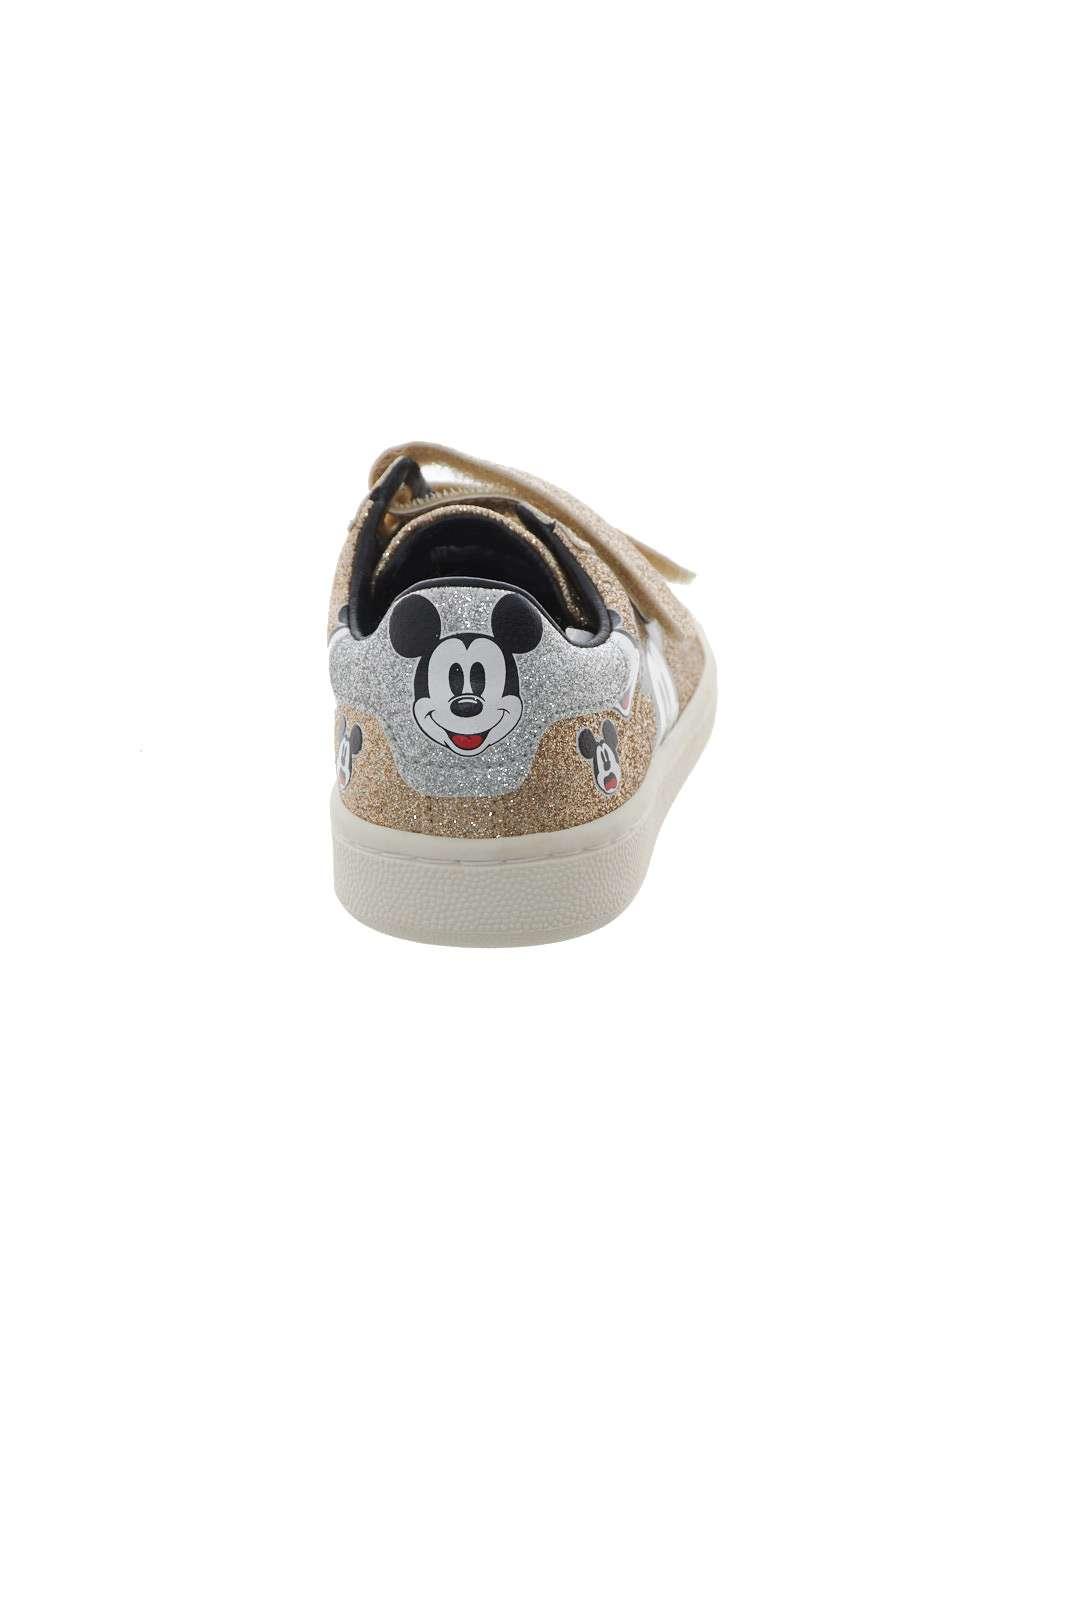 https://www.parmax.com/media/catalog/product/A/I/AI-outlet_parmax-scarpe-bambina-MoaConcept-MDJ269-D.jpg